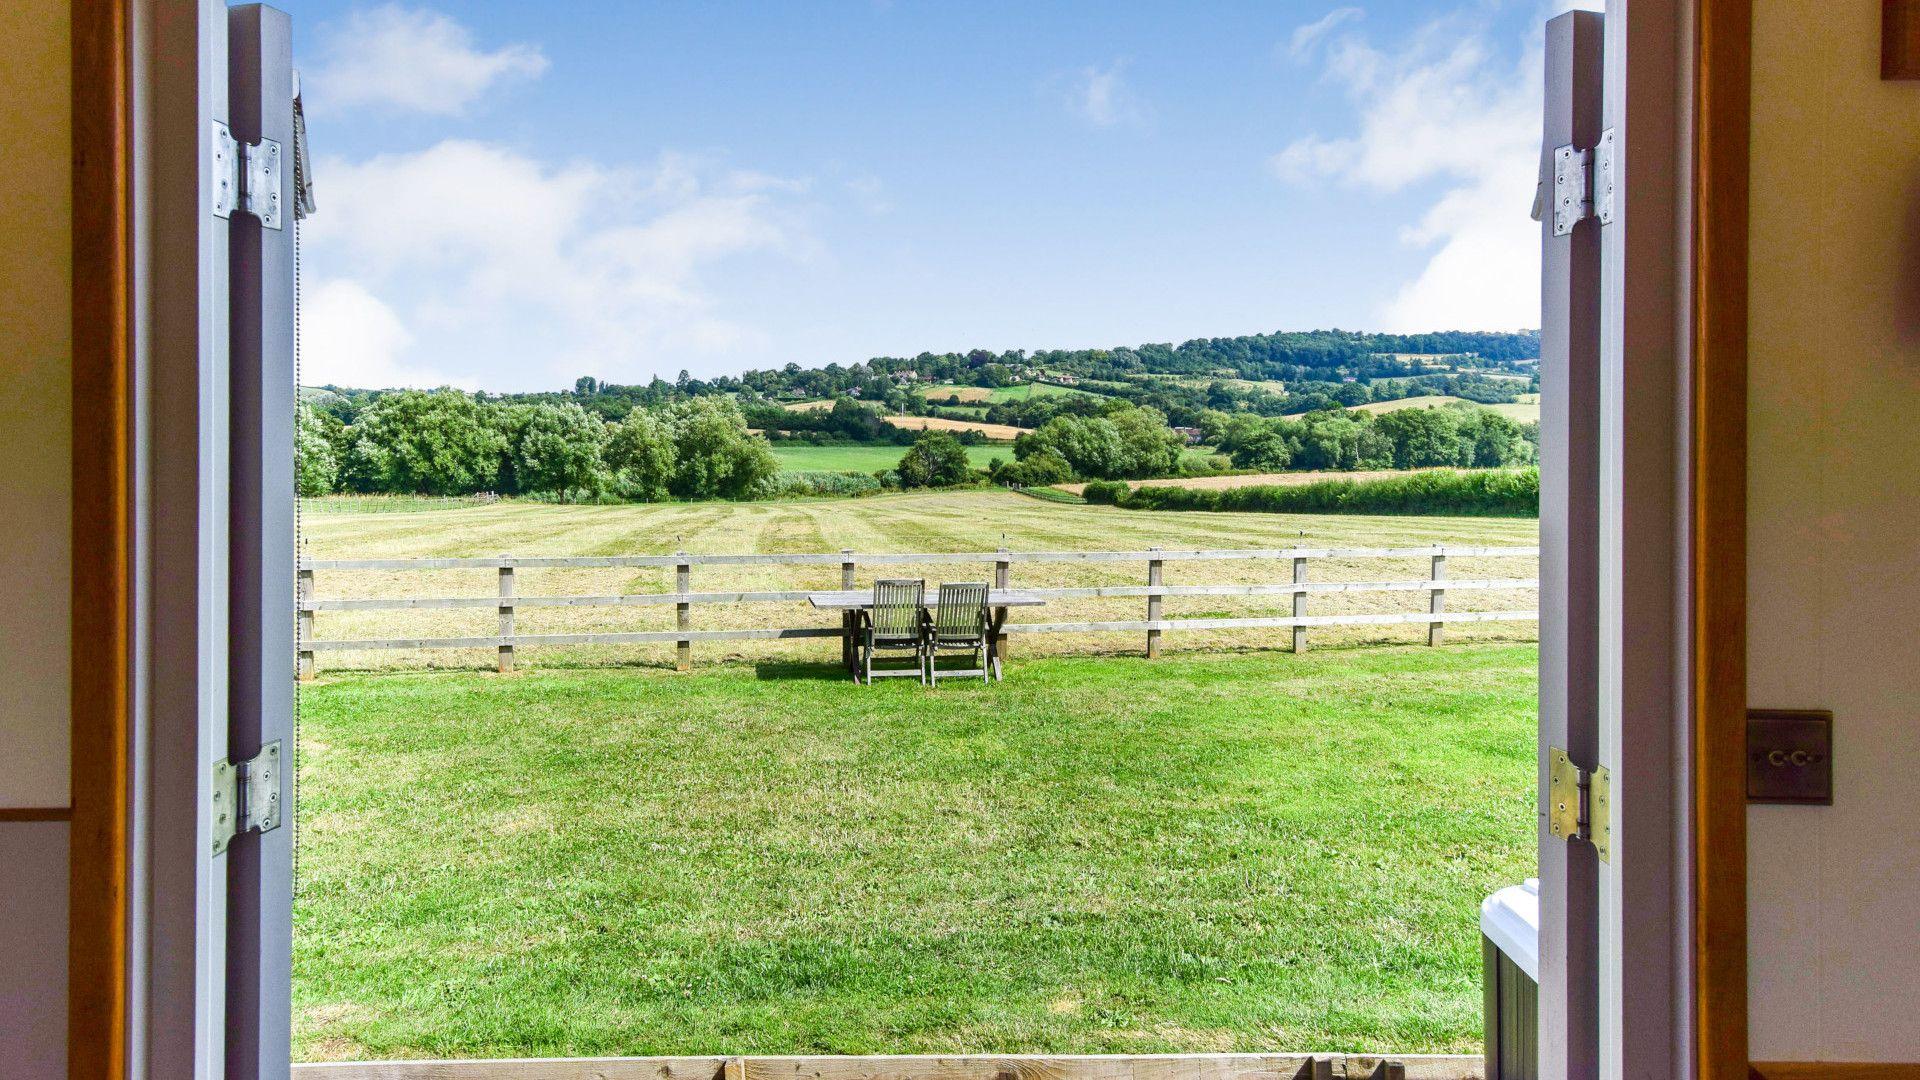 Hut views, Shepherds Hut at Avon Farm, Bolthole Retreats